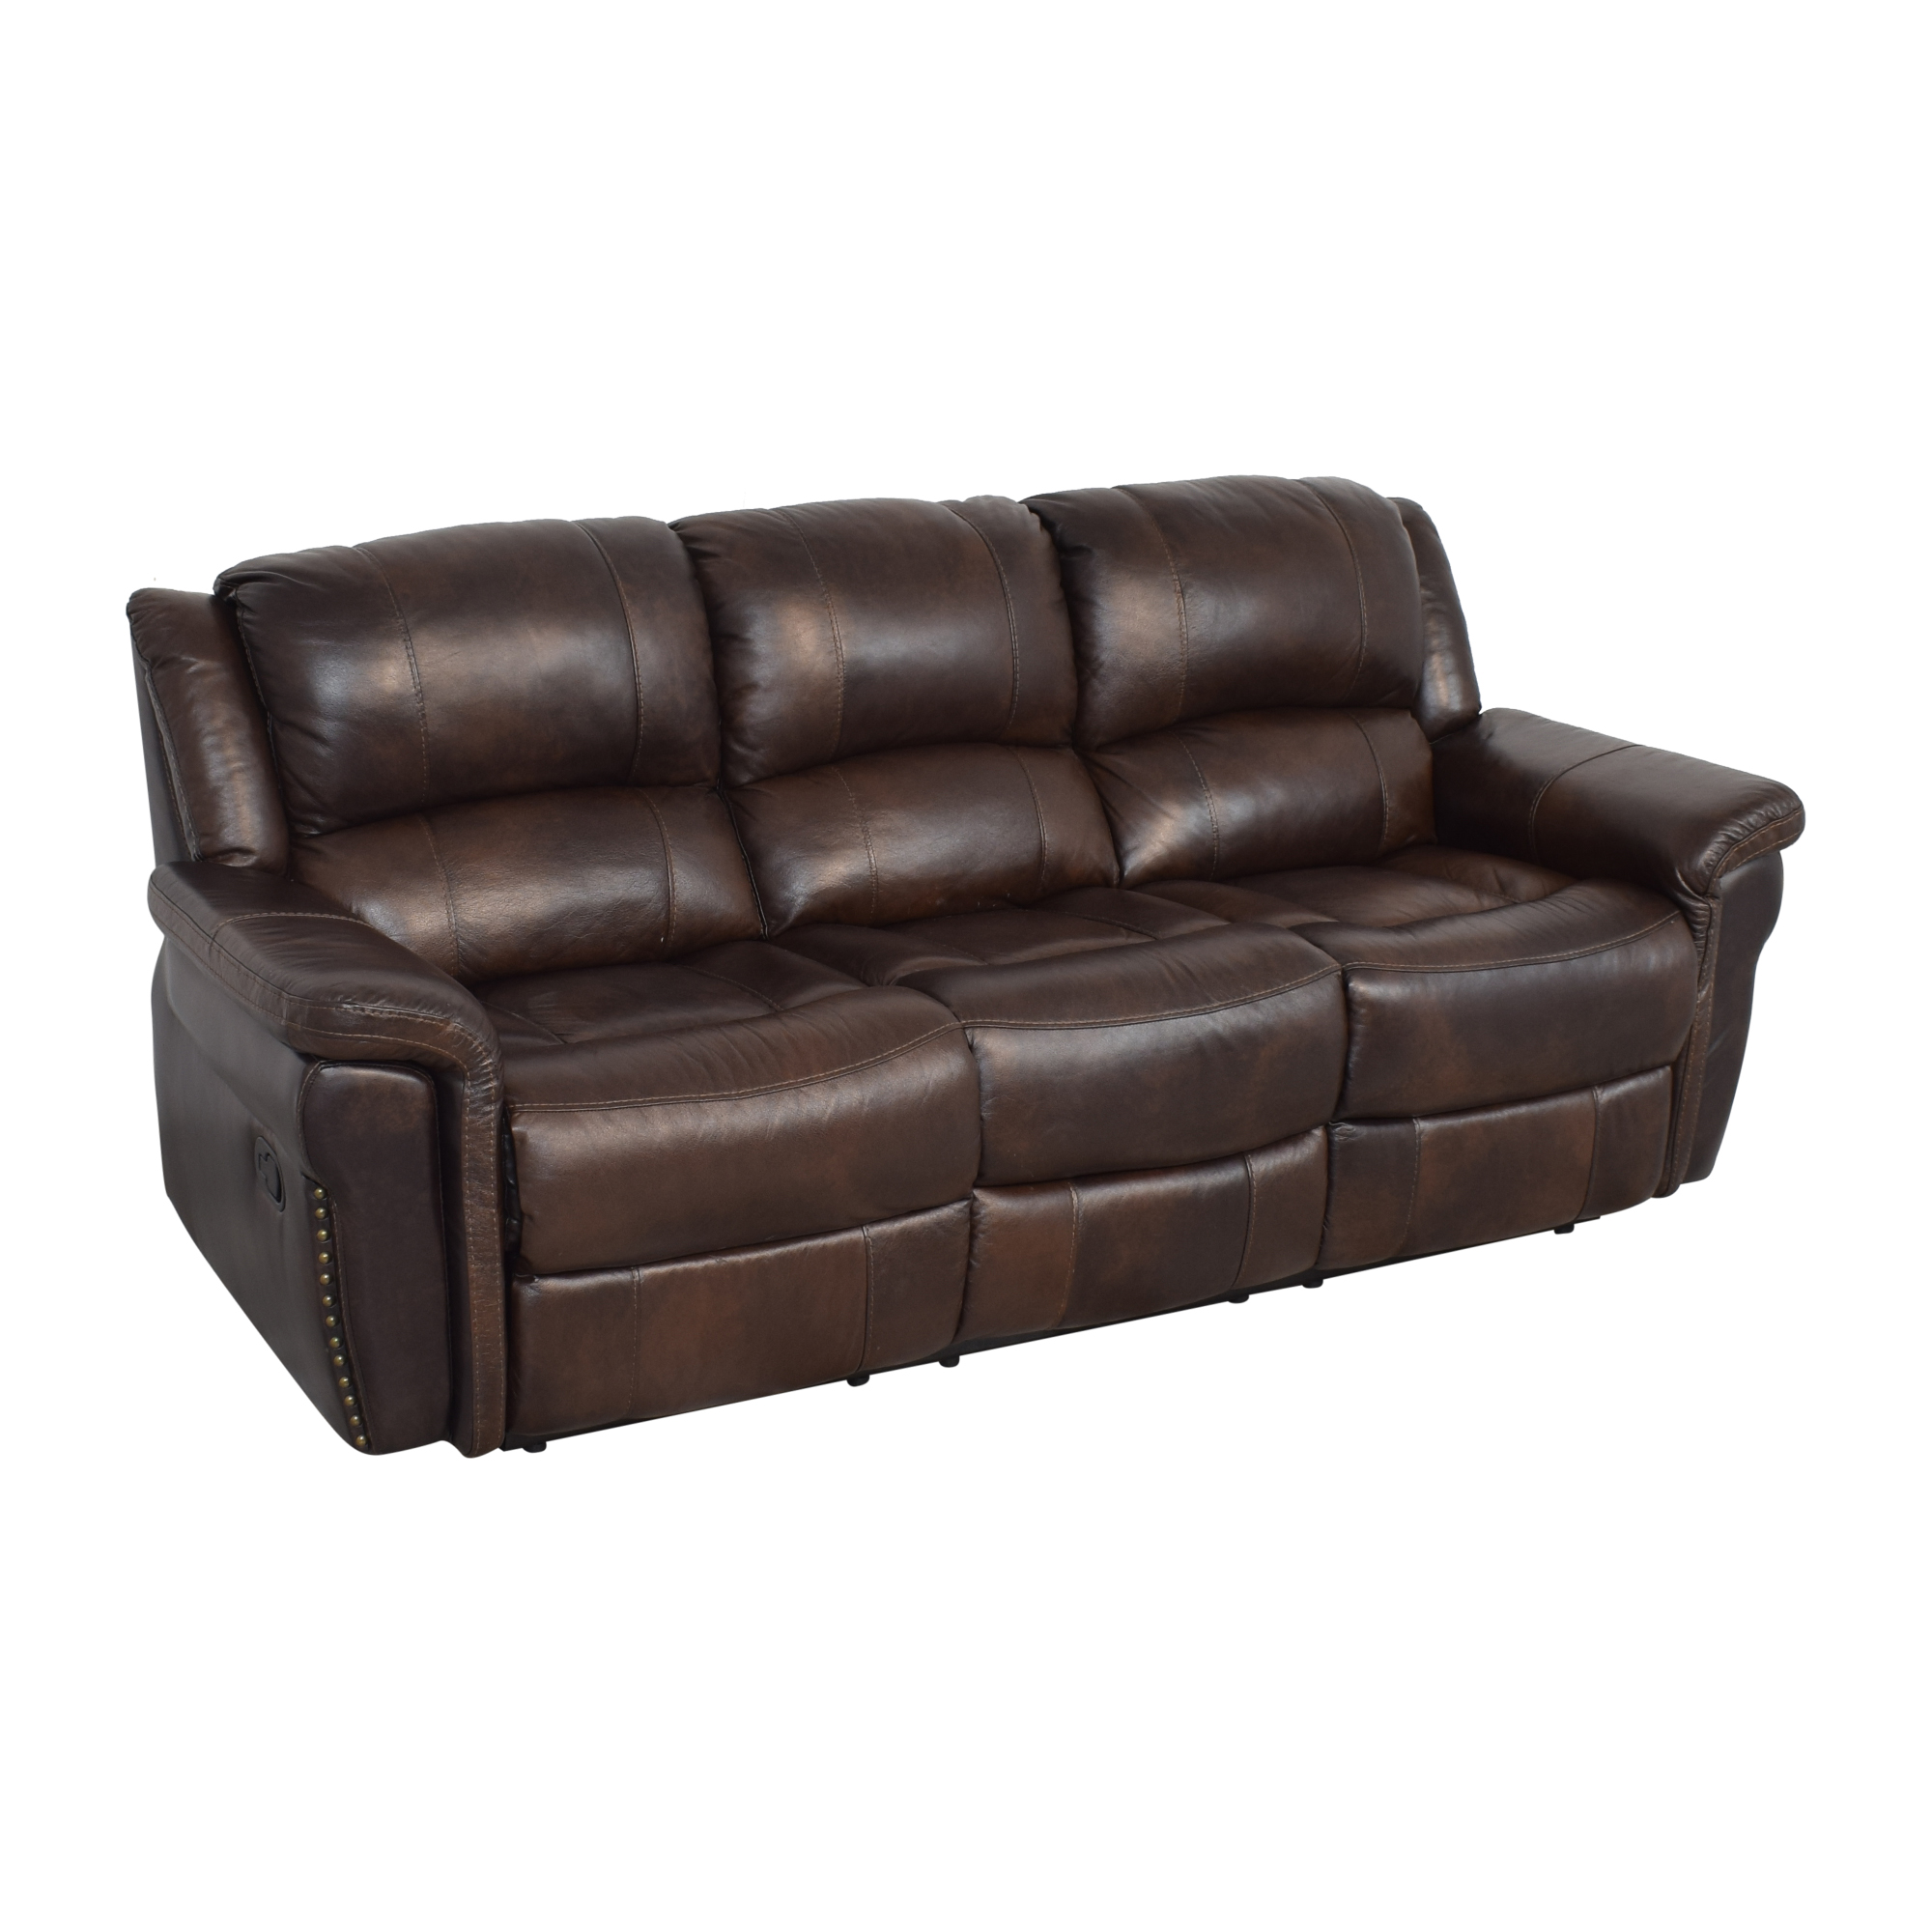 buy  Delancey Street Furniture Recliner Sofa online